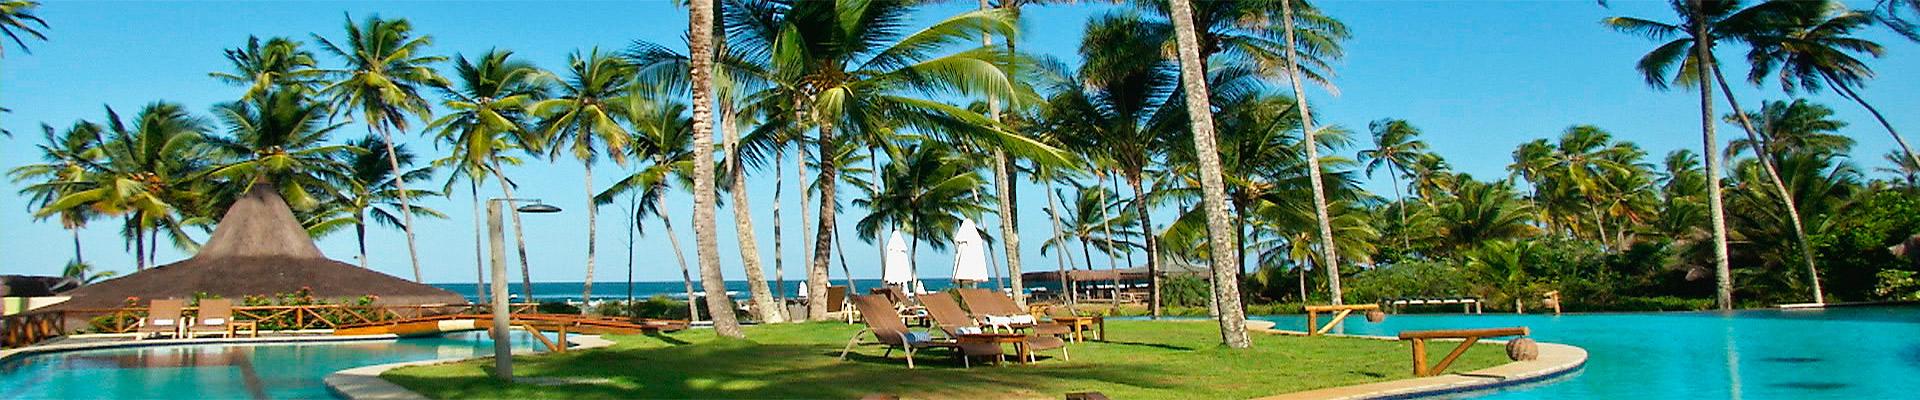 Kiaroa Eco Luxury Beach Resort